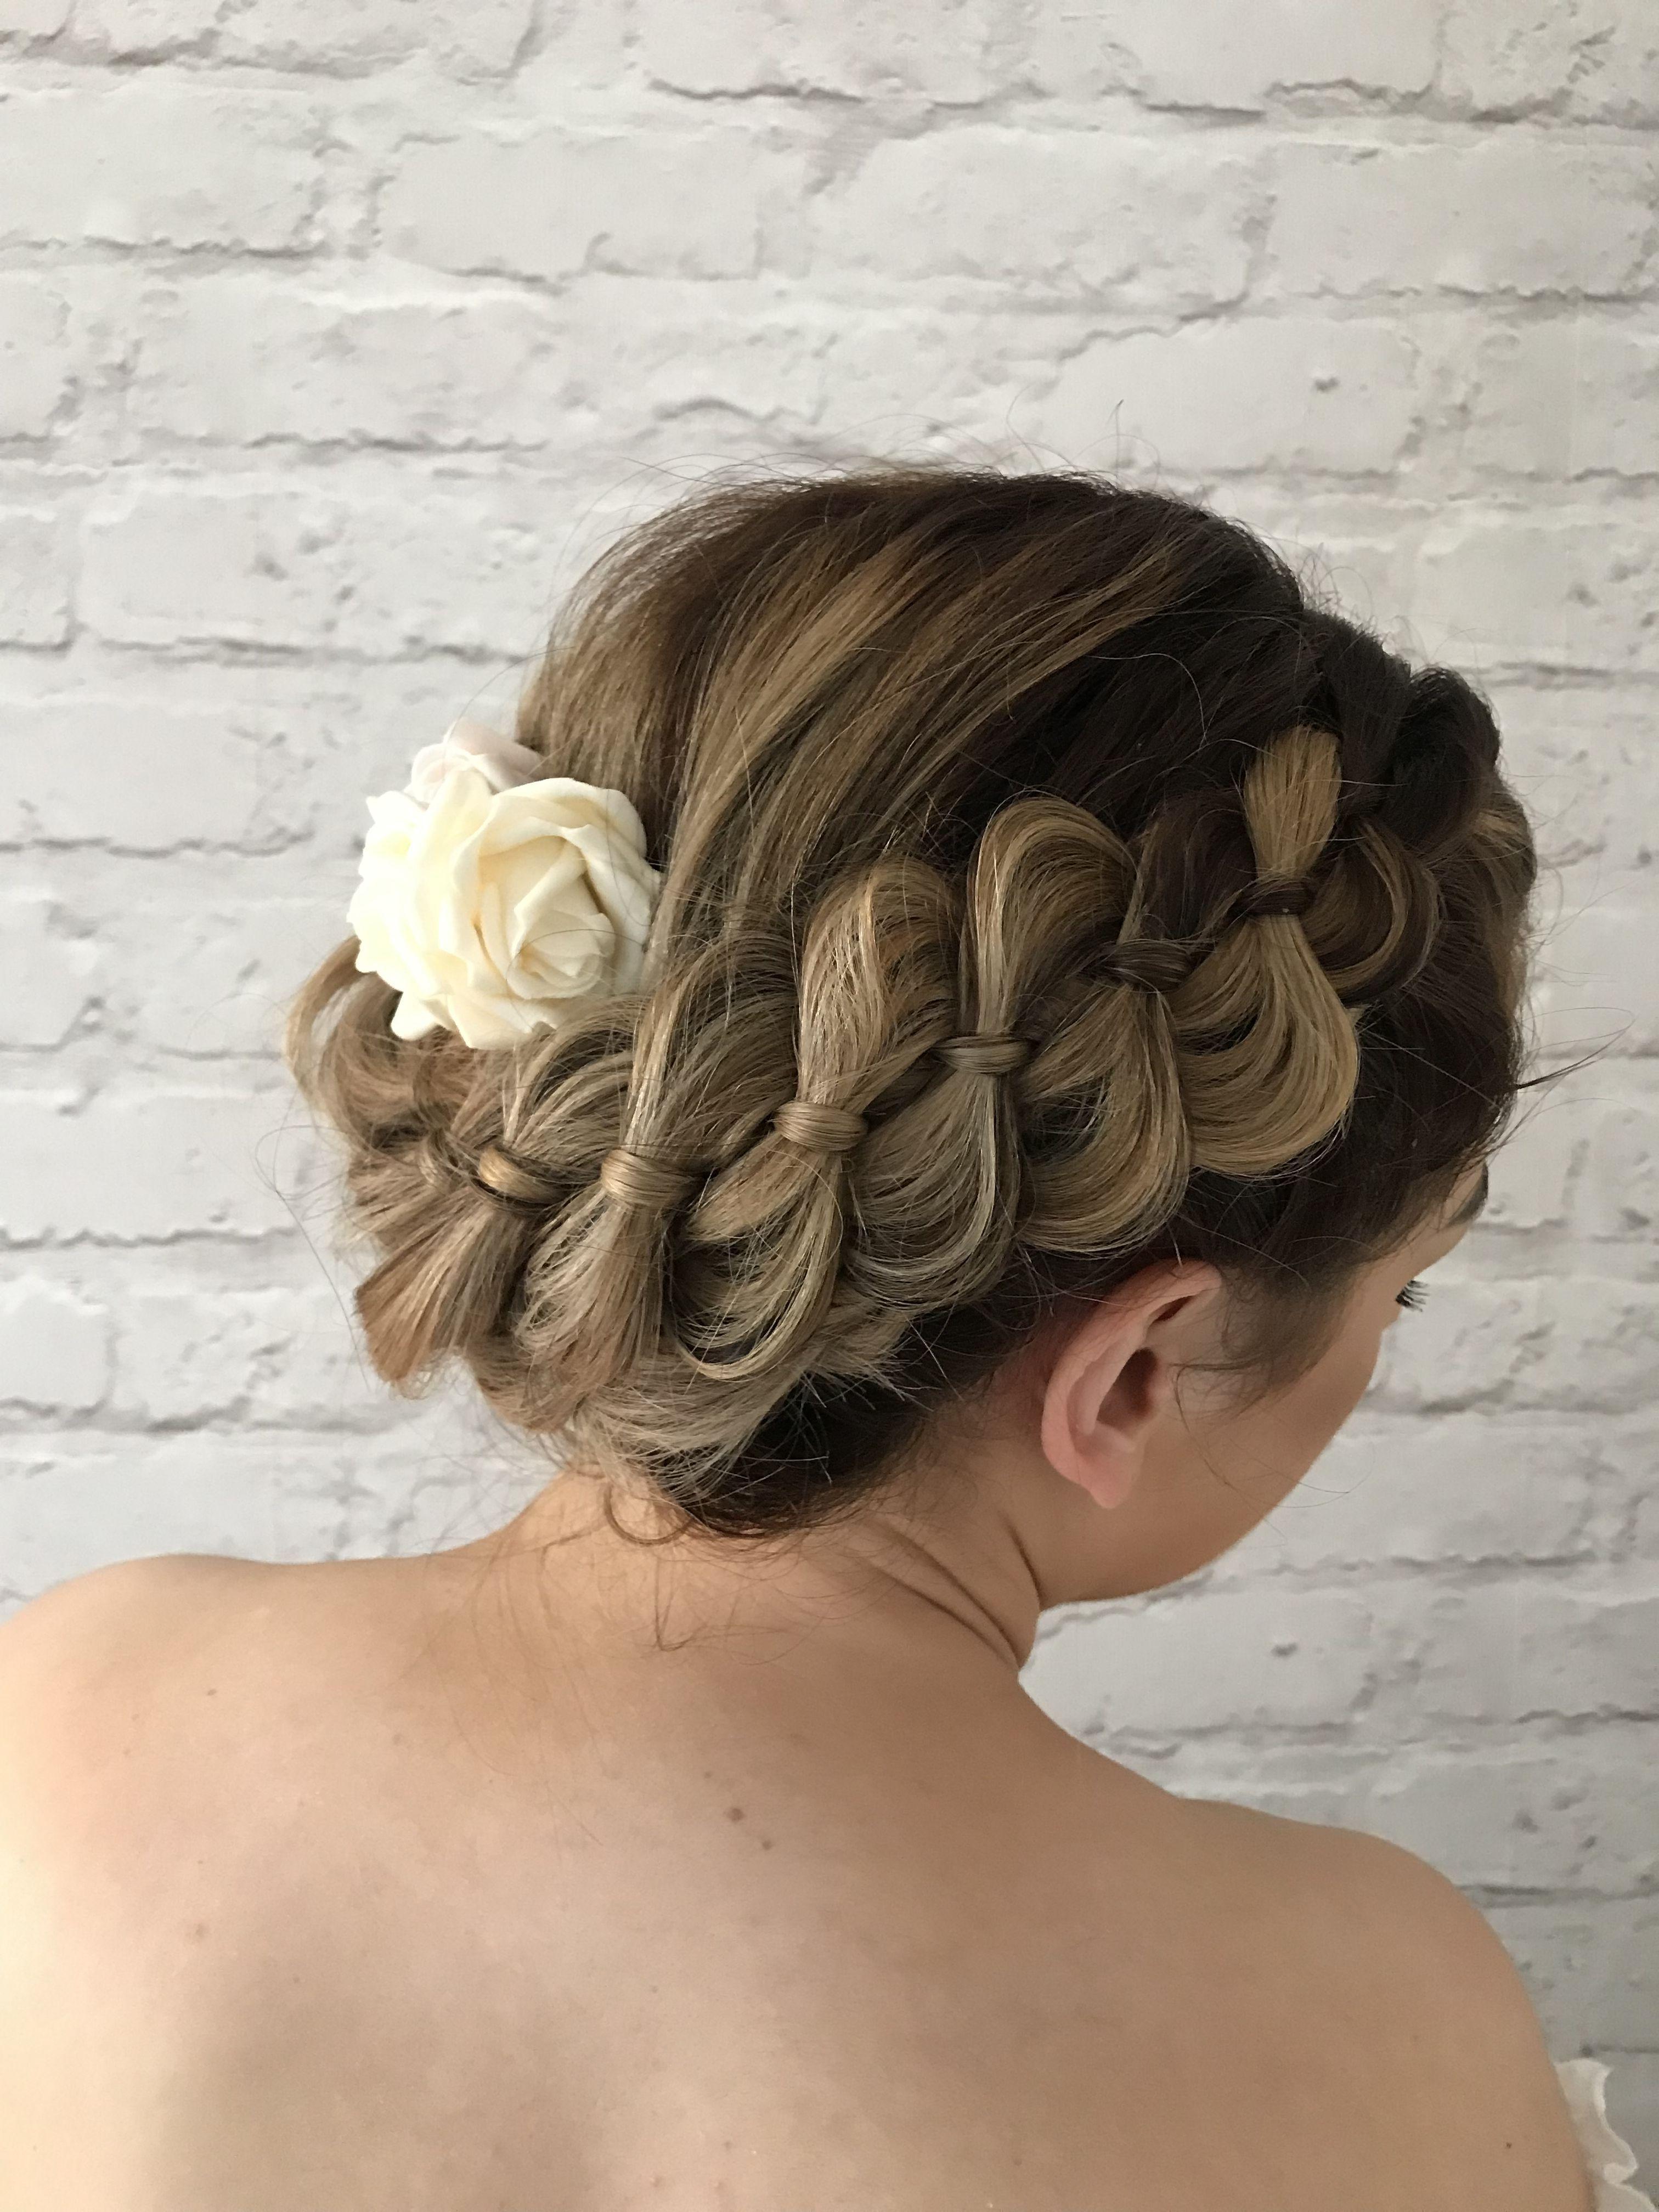 Plaits Braids Braids Plaits Updo Hairstylesforweddings Wedding Hair Tips Blonde Bridal Hair Bridal Hair And Makeup